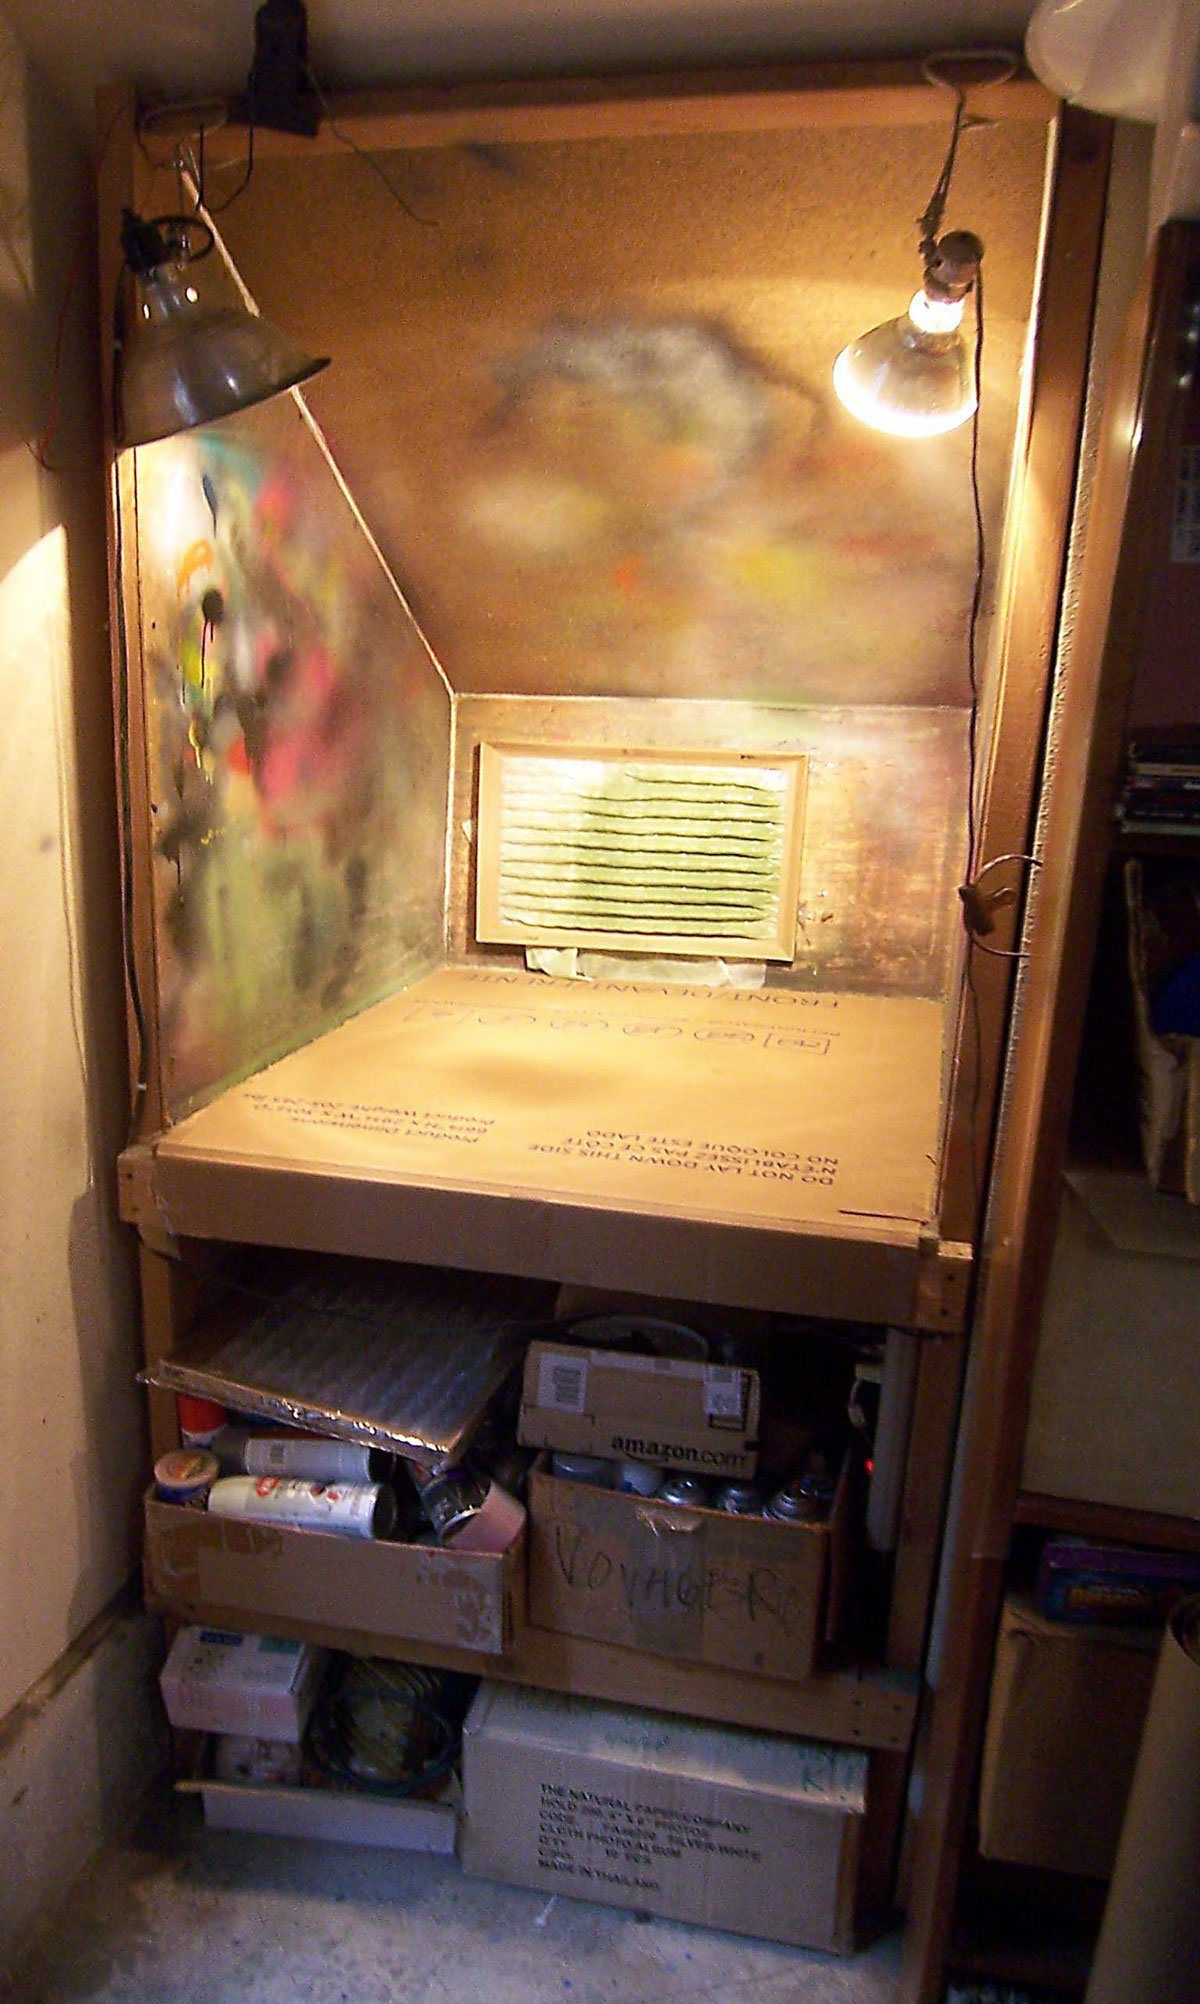 Toy Inventor's Notebook Stairwell Spray Booth Spray